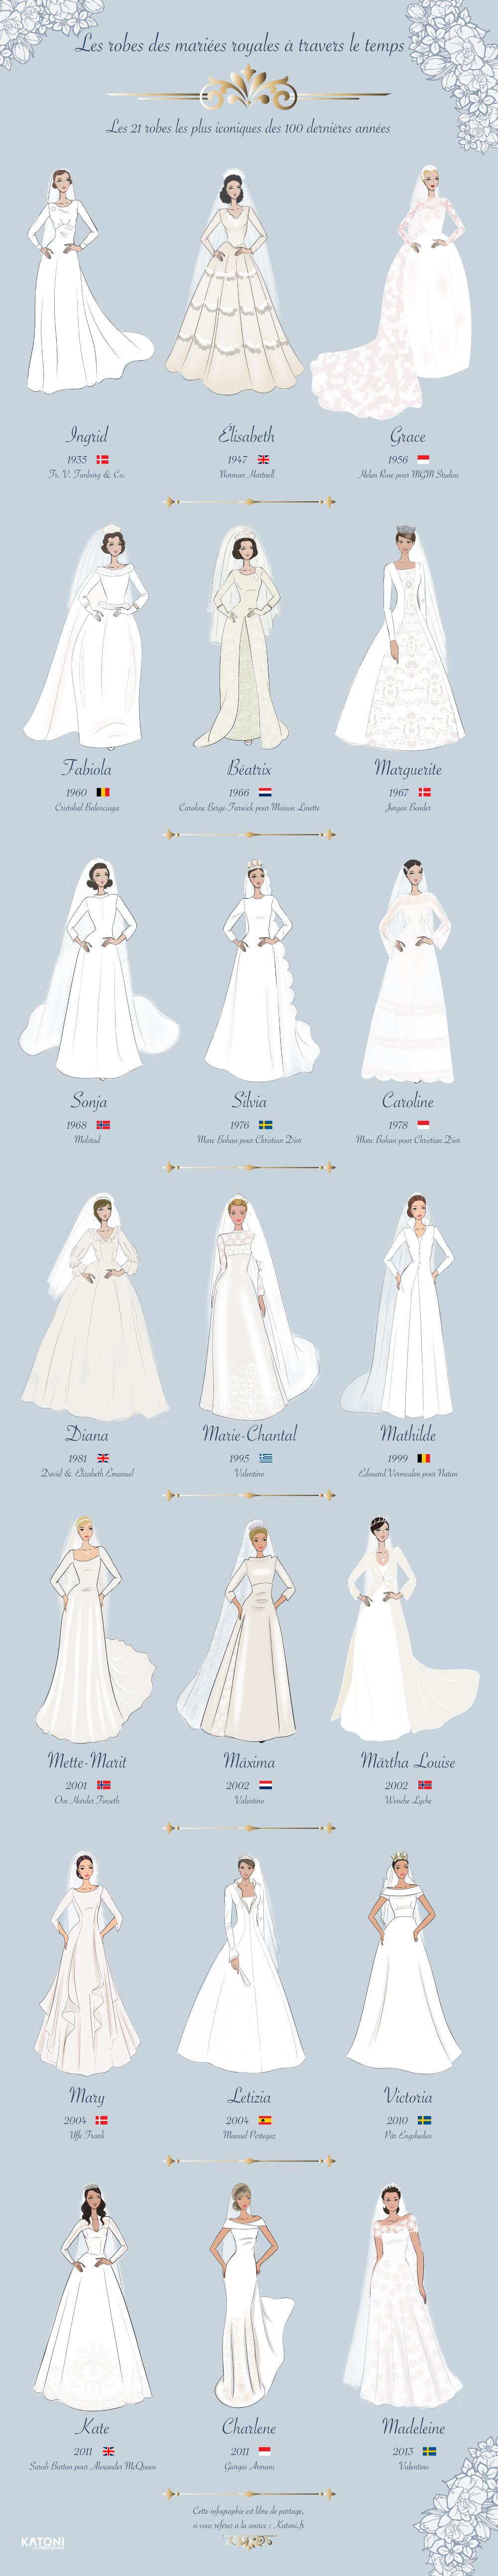 robes-mariees-royales.jpg